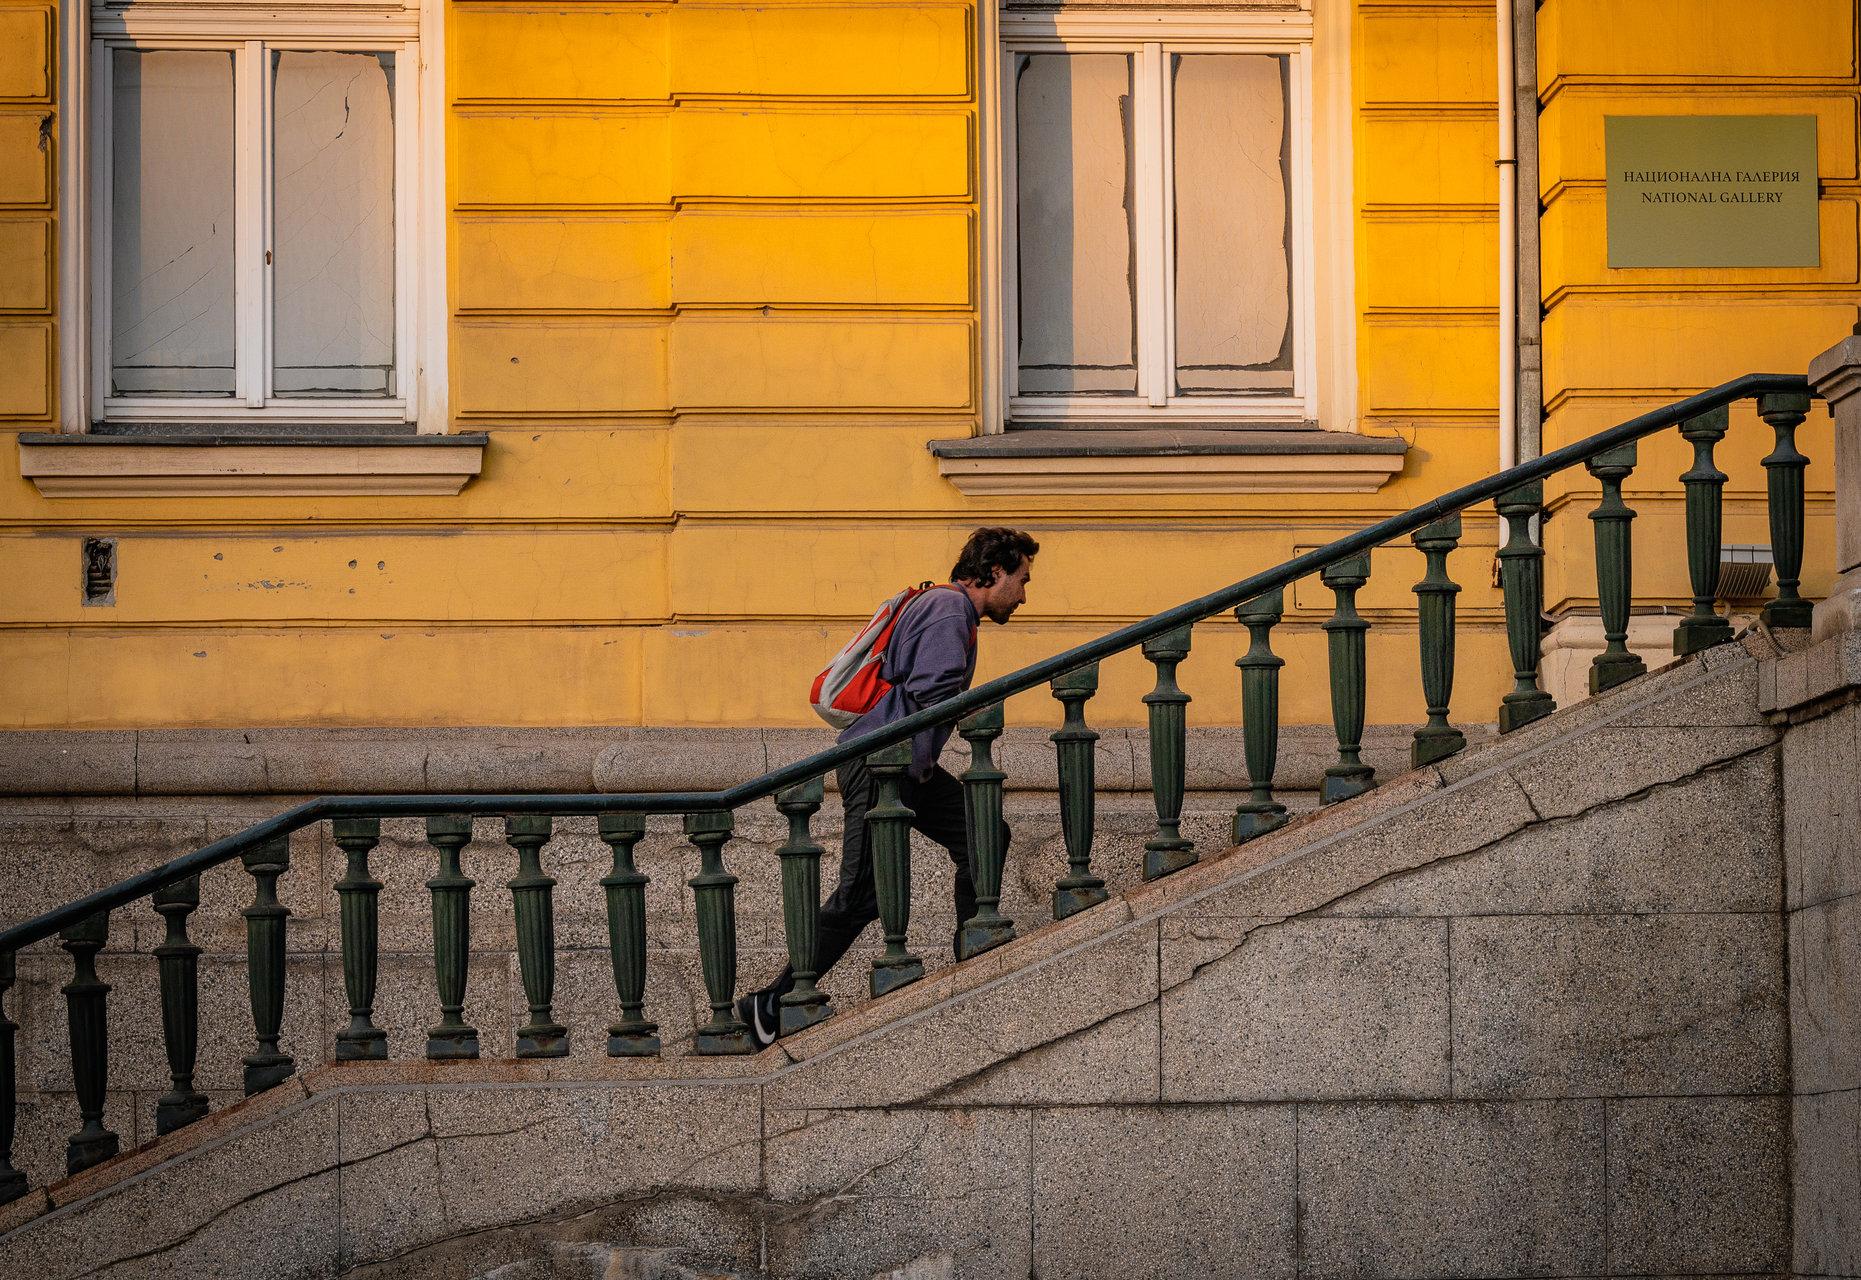 Photo in Street | Author Mariyan Marinov - mariano | PHOTO FORUM